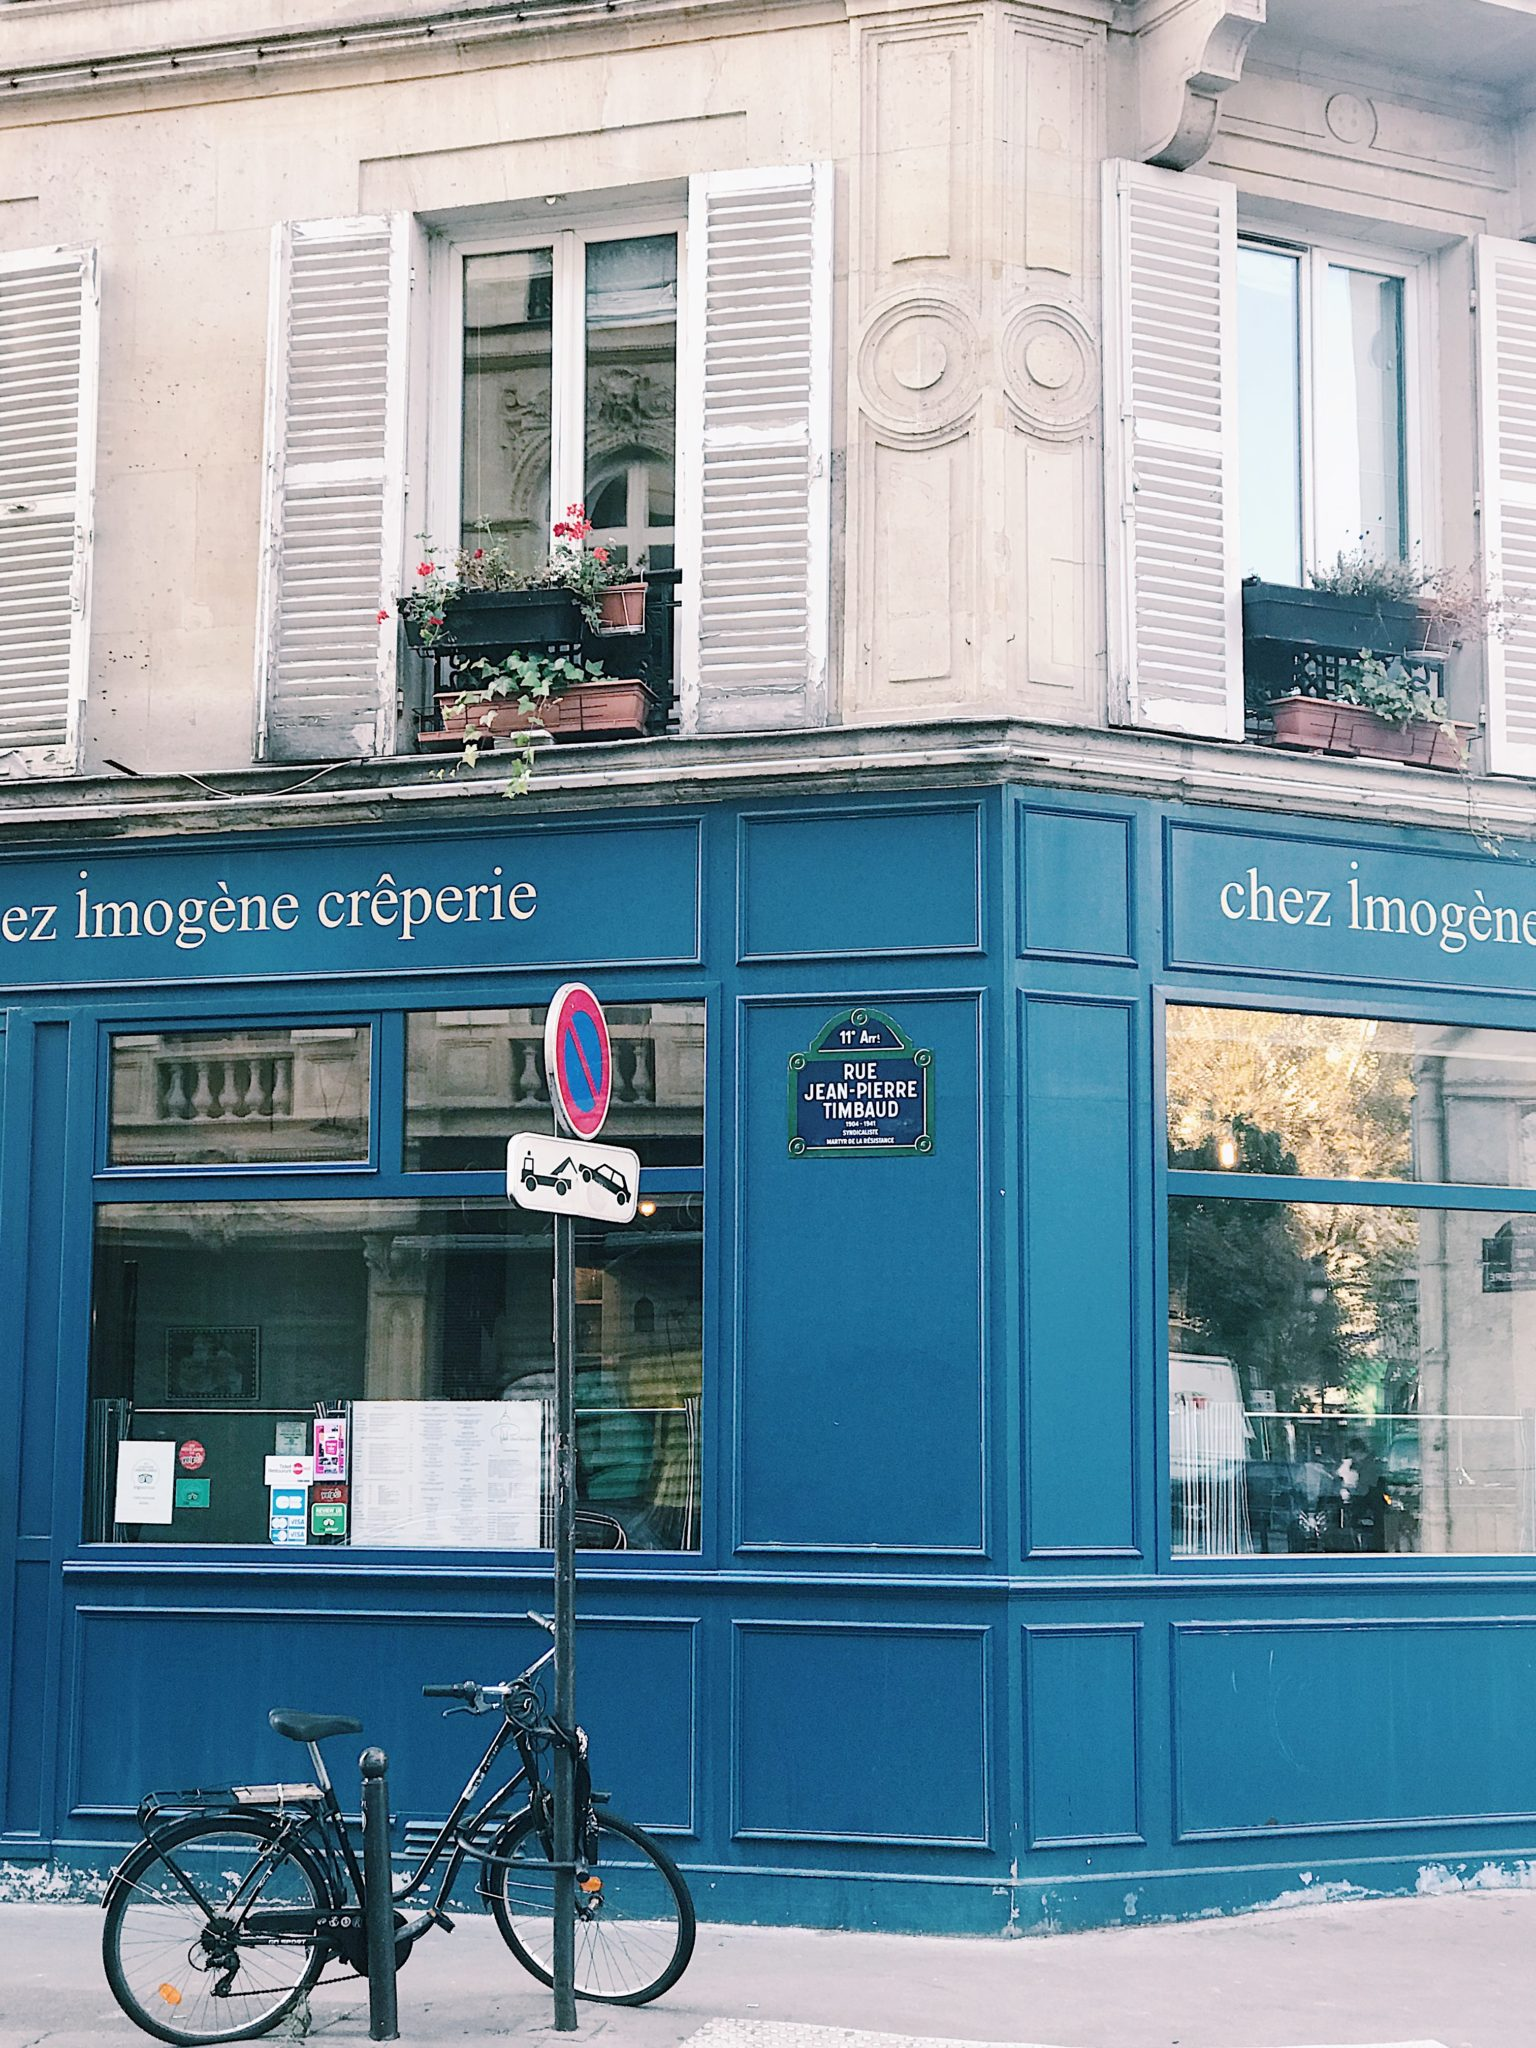 Chez Imogene Creperie Paris